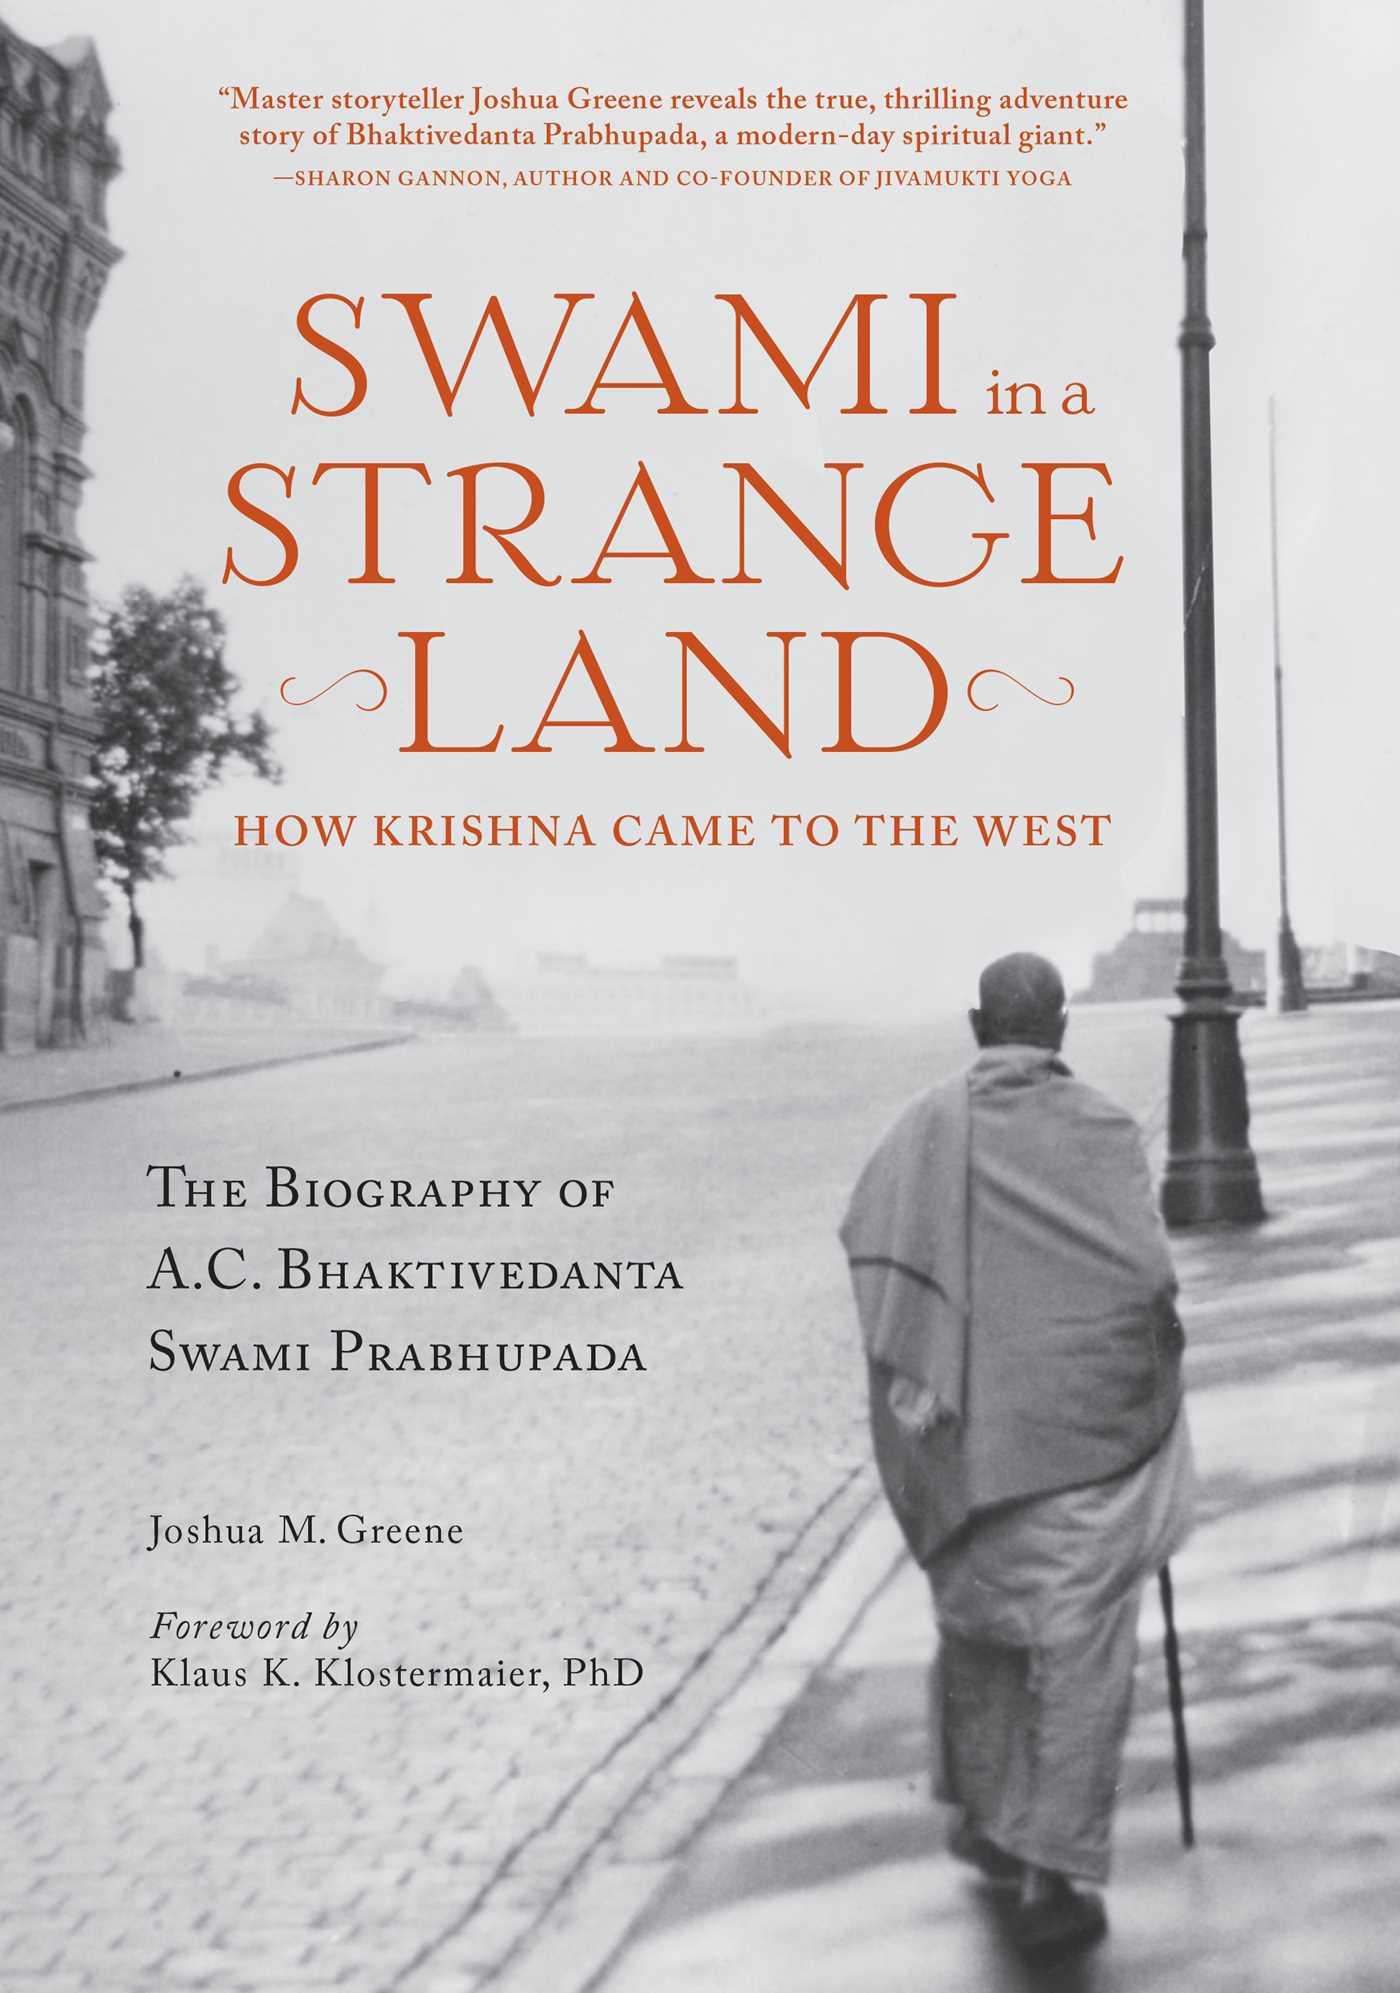 Swami in a Strange Land by Joshua M Greene